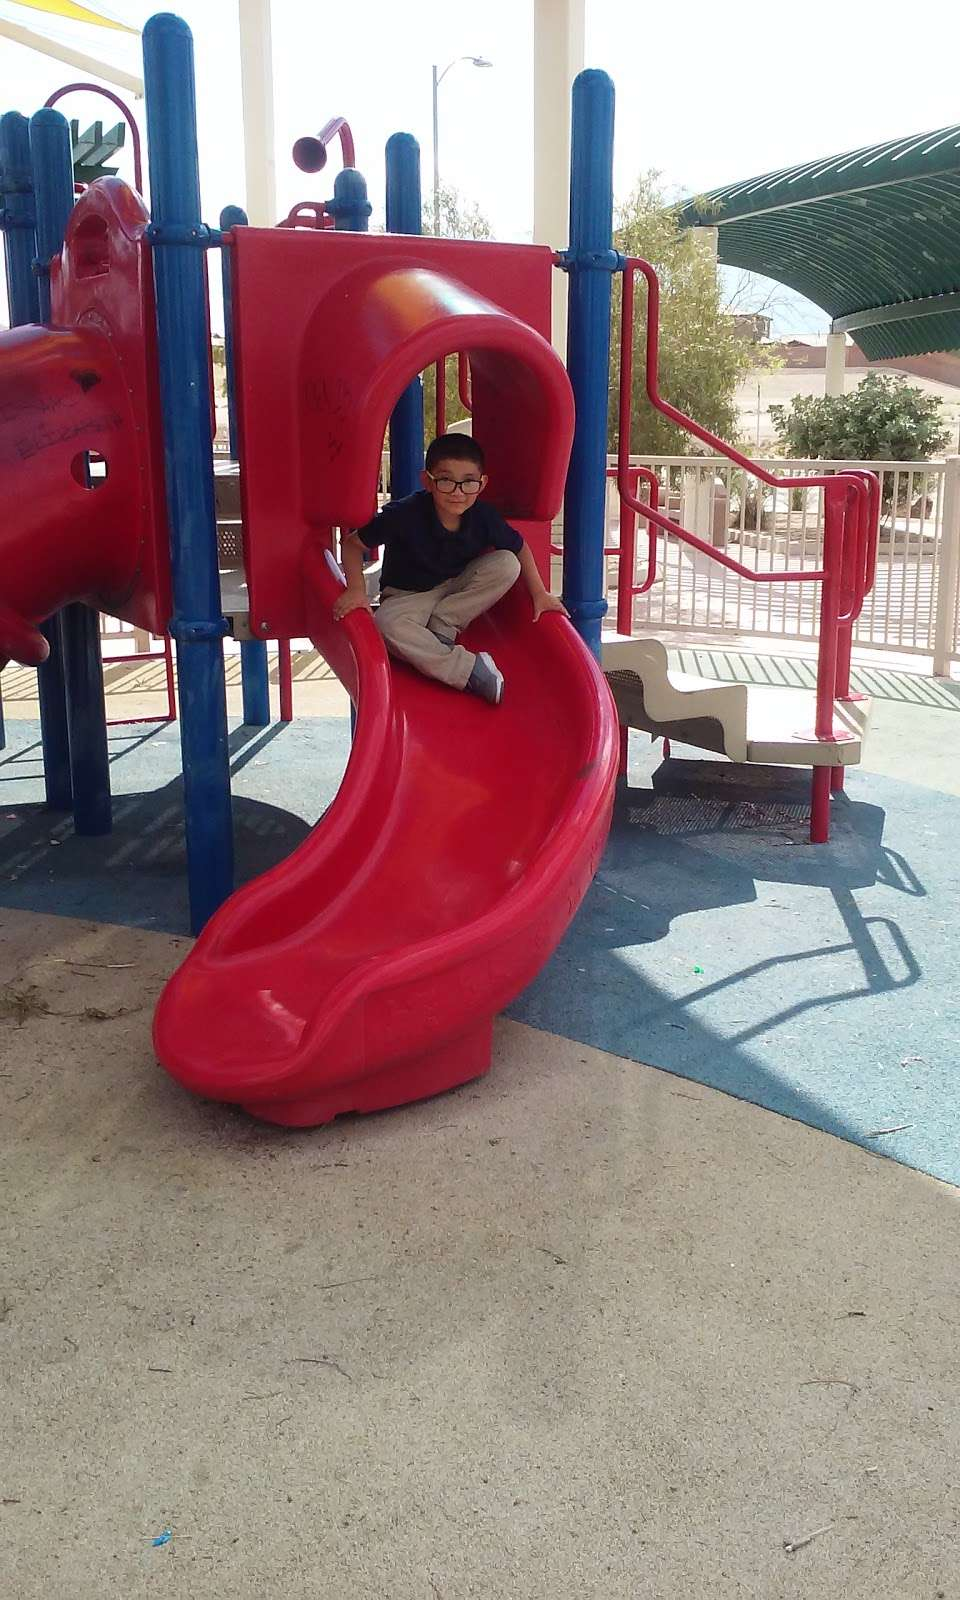 Desert Horizons Park - park  | Photo 6 of 10 | Address: 3750 Simmons Street,, North Las Vegas, NV 89032, USA | Phone: (702) 633-1171